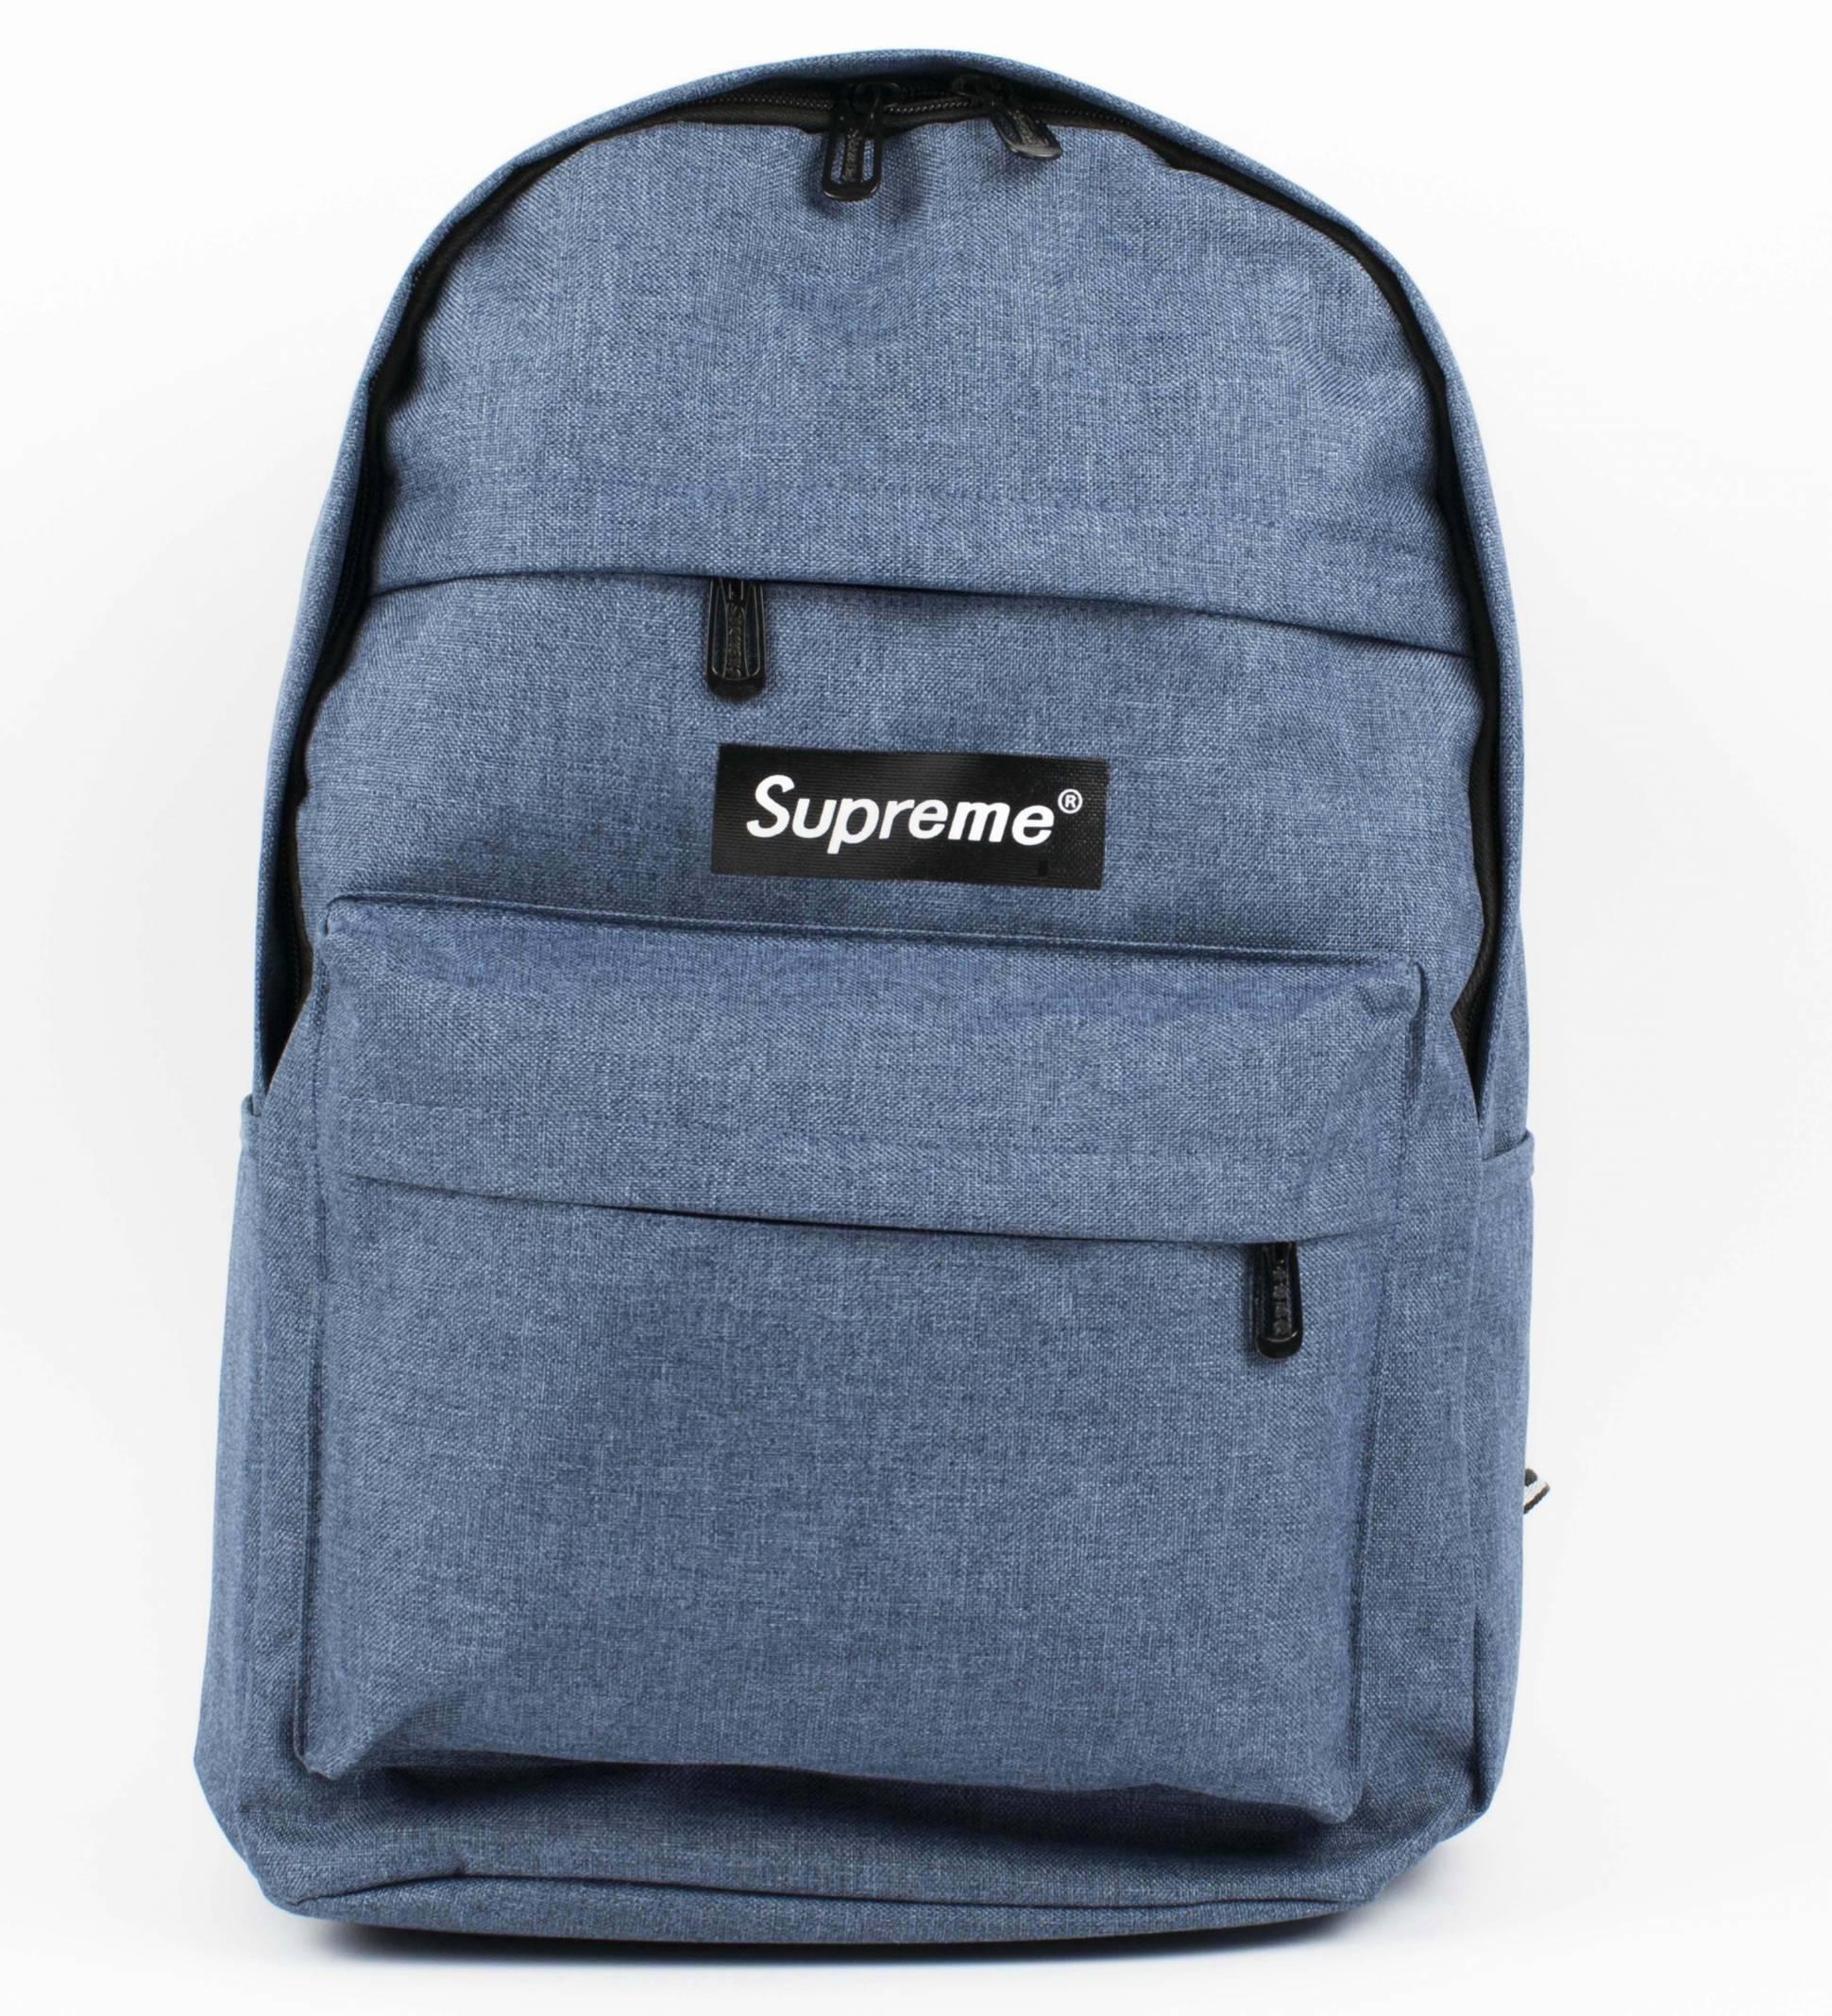 96cbd039 Рюкзак Supreme S541 синий купить по цене 1 690 руб. в интернет ...